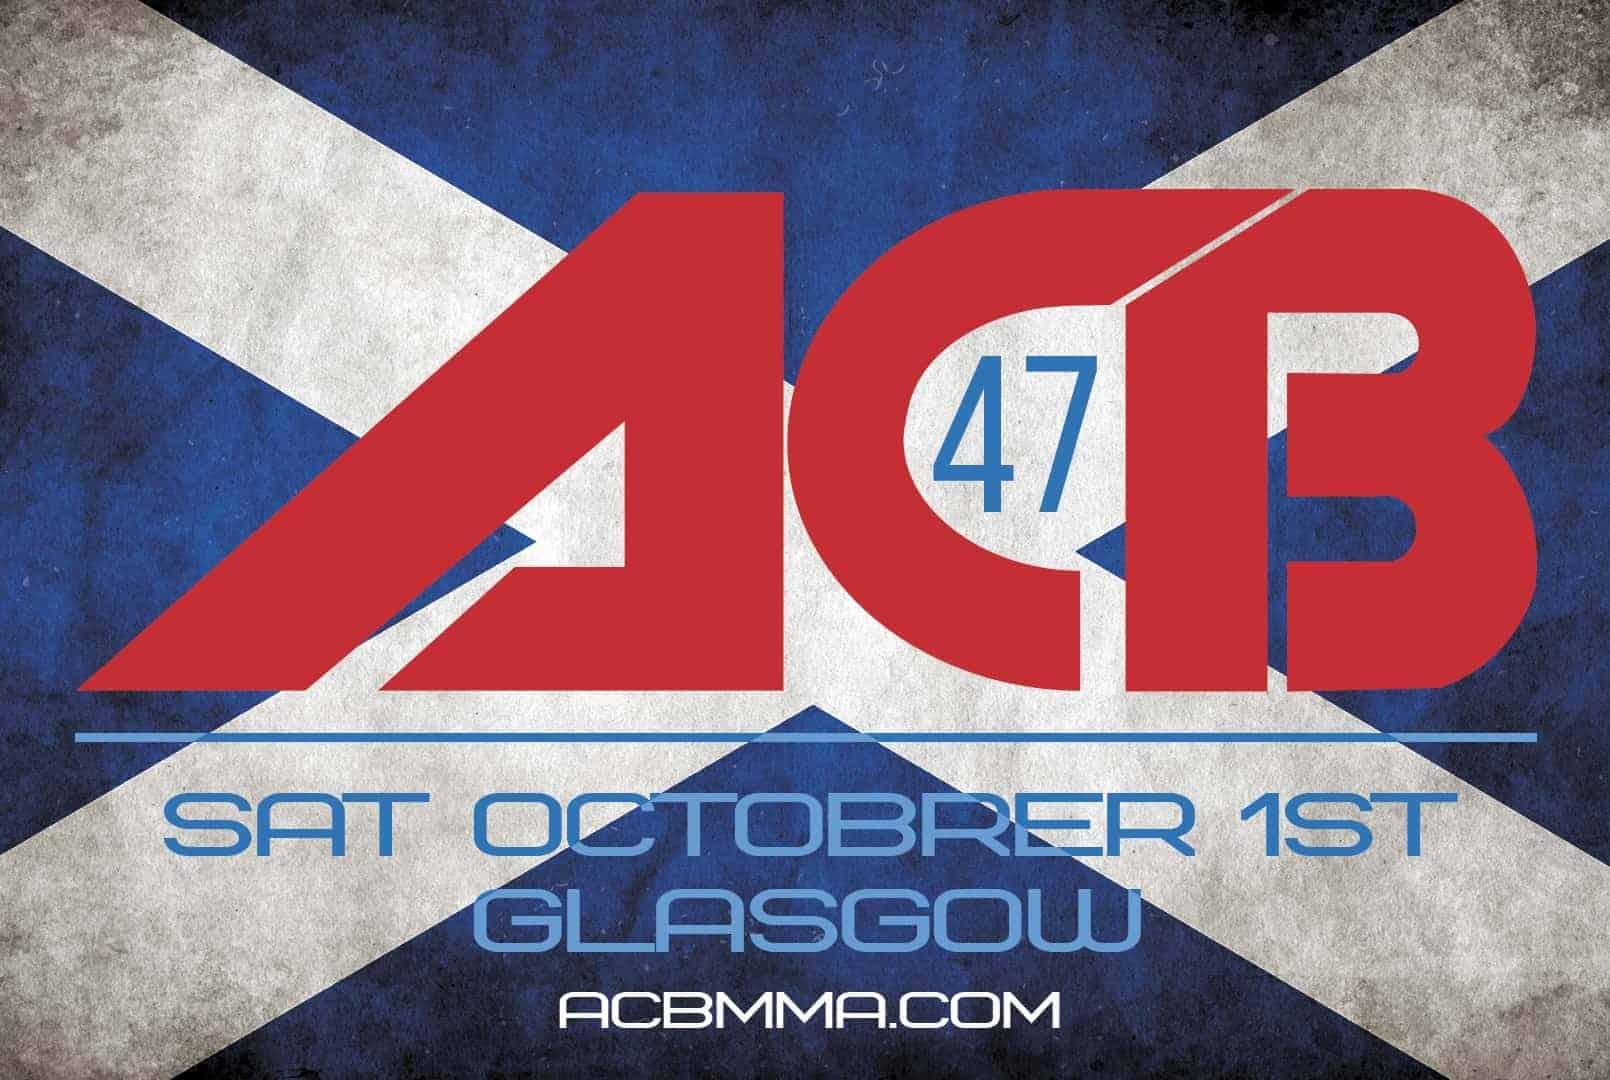 acb-47-1